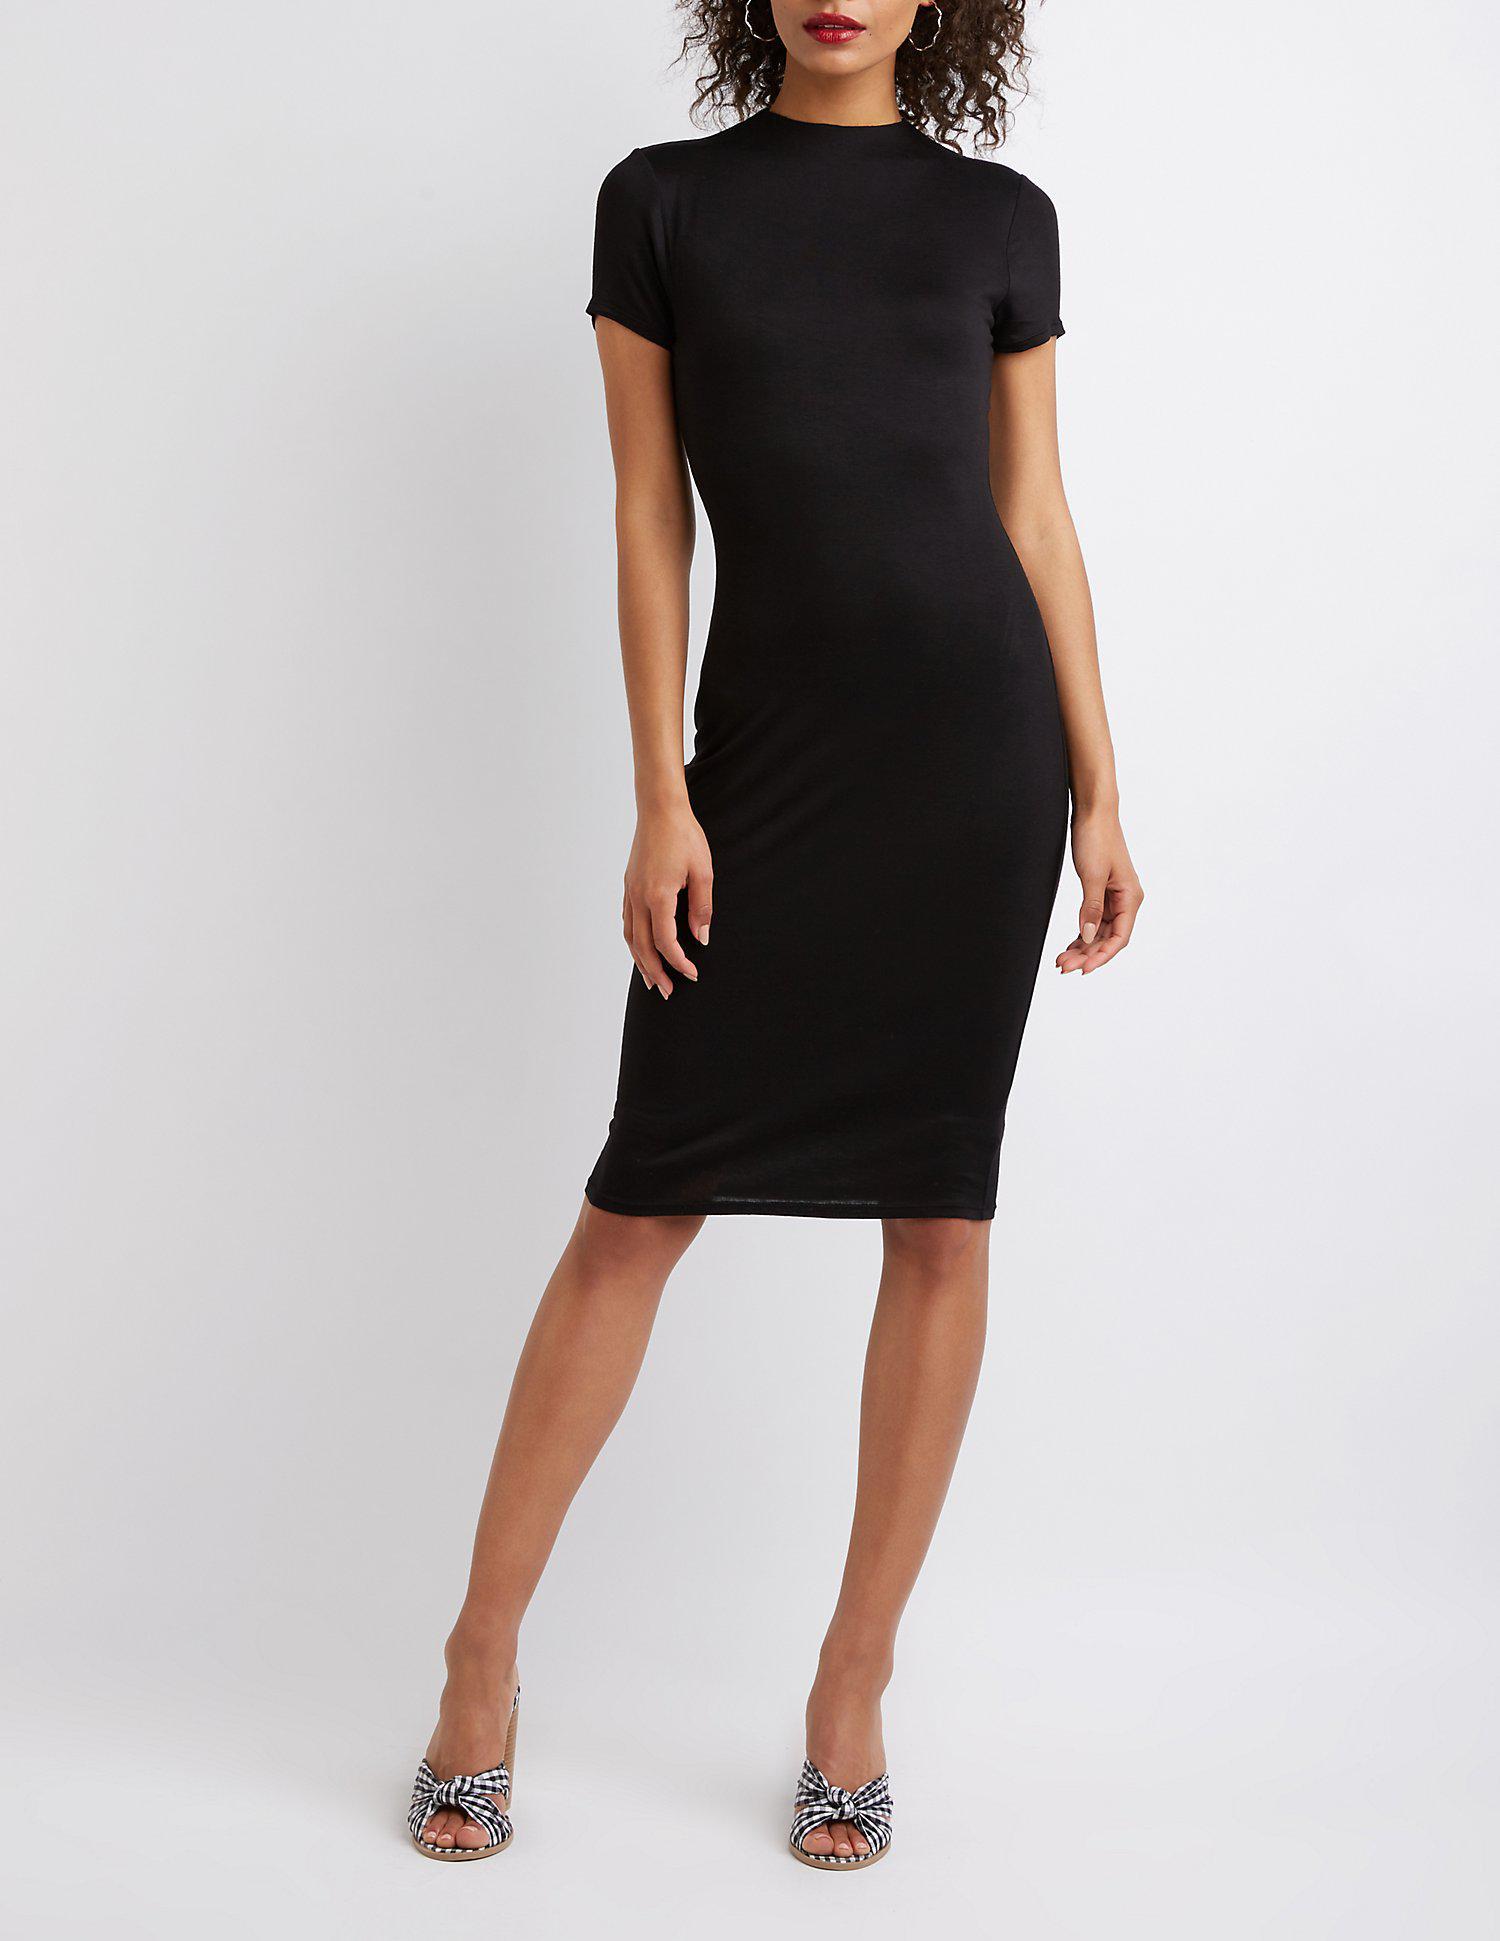 ae0b249d0c7 Lyst - Charlotte Russe Mock Neck Bodycon Midi Dress in Black